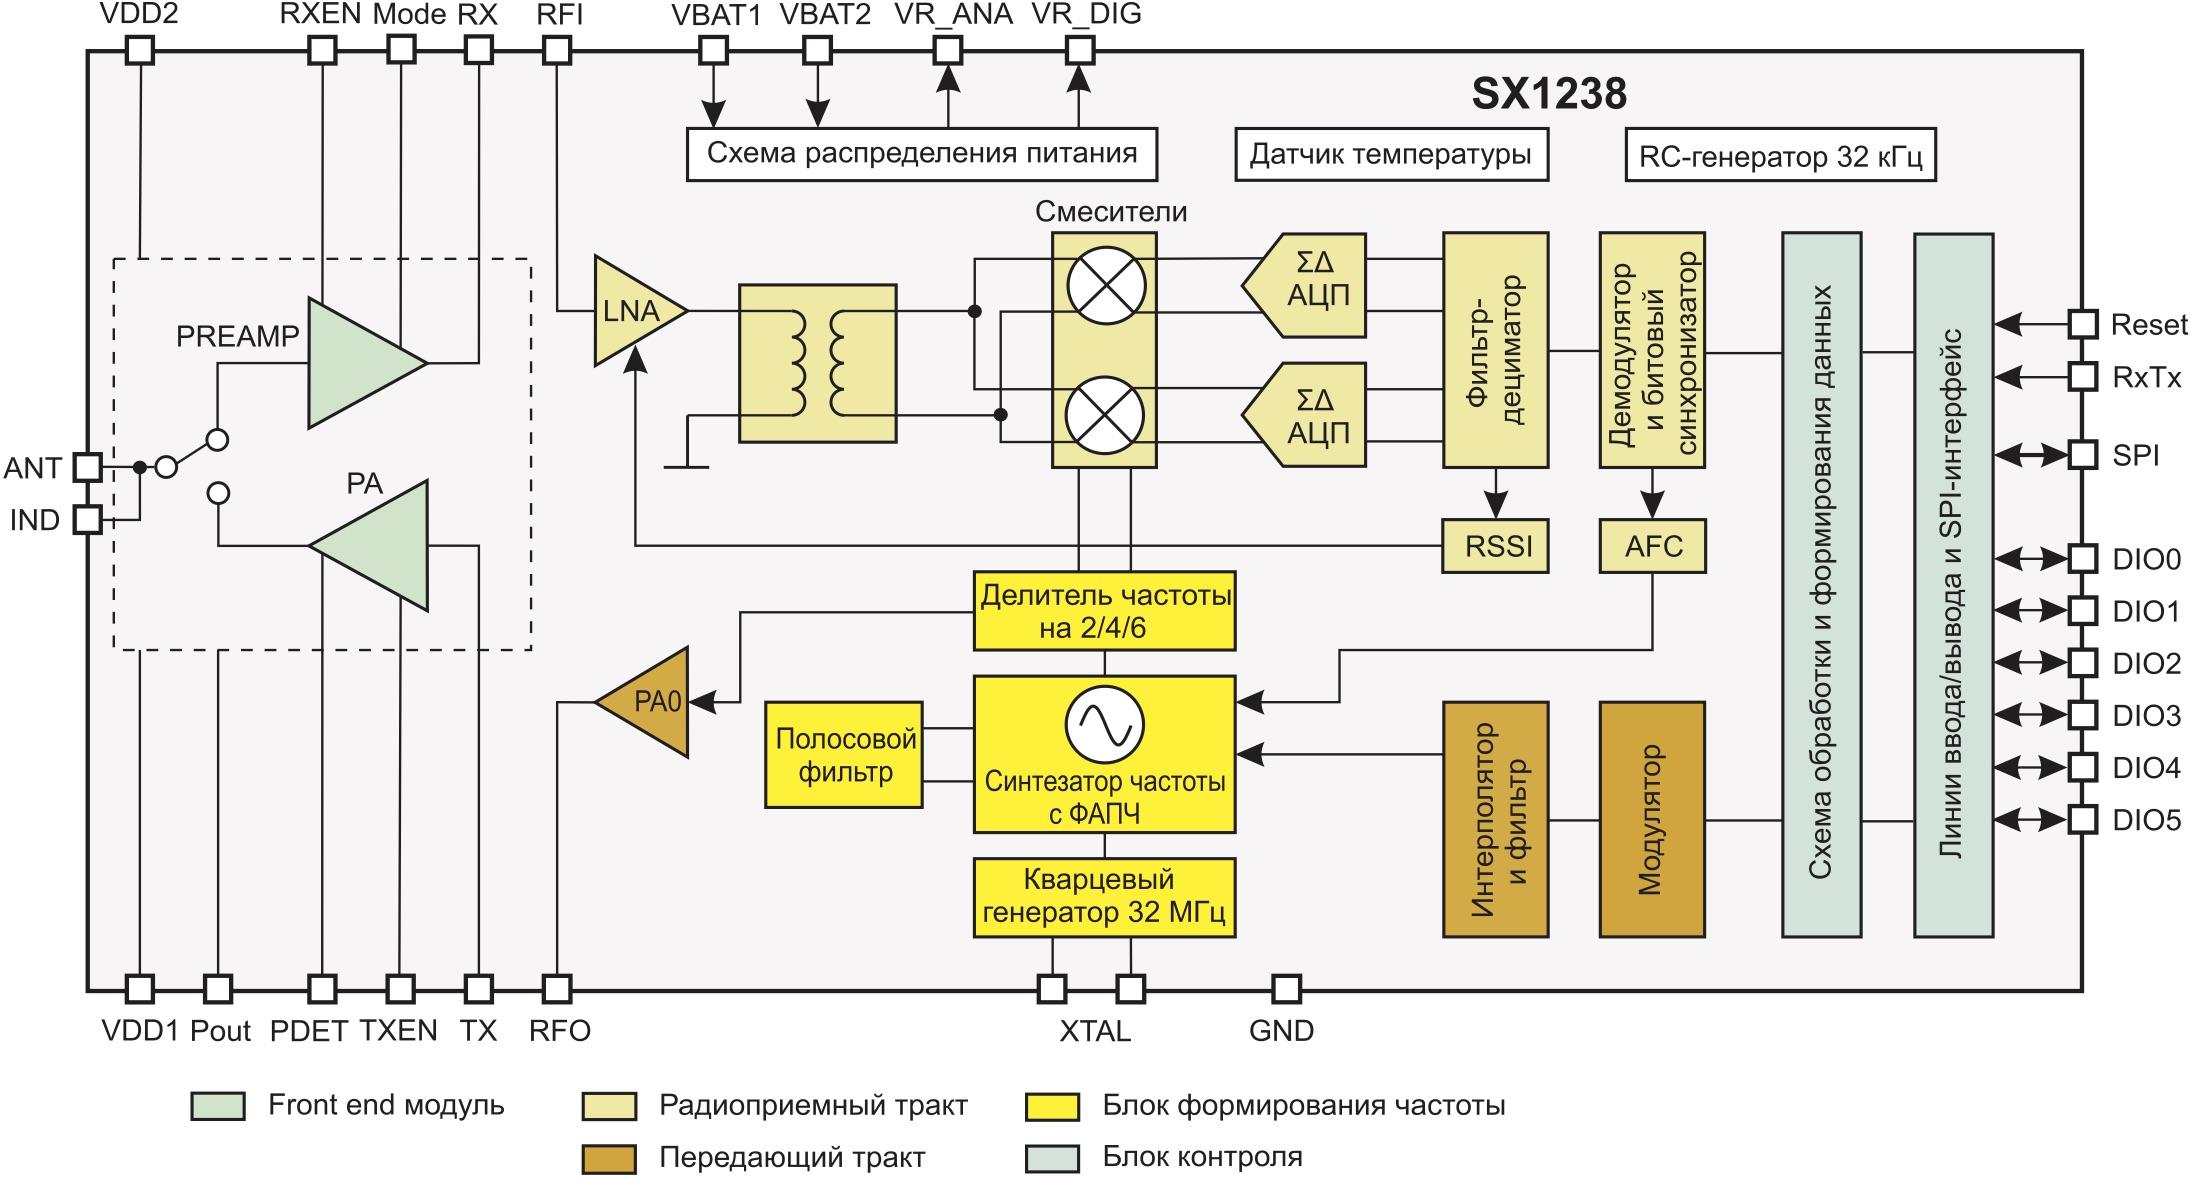 Внутренняя структура трансивера SX1238